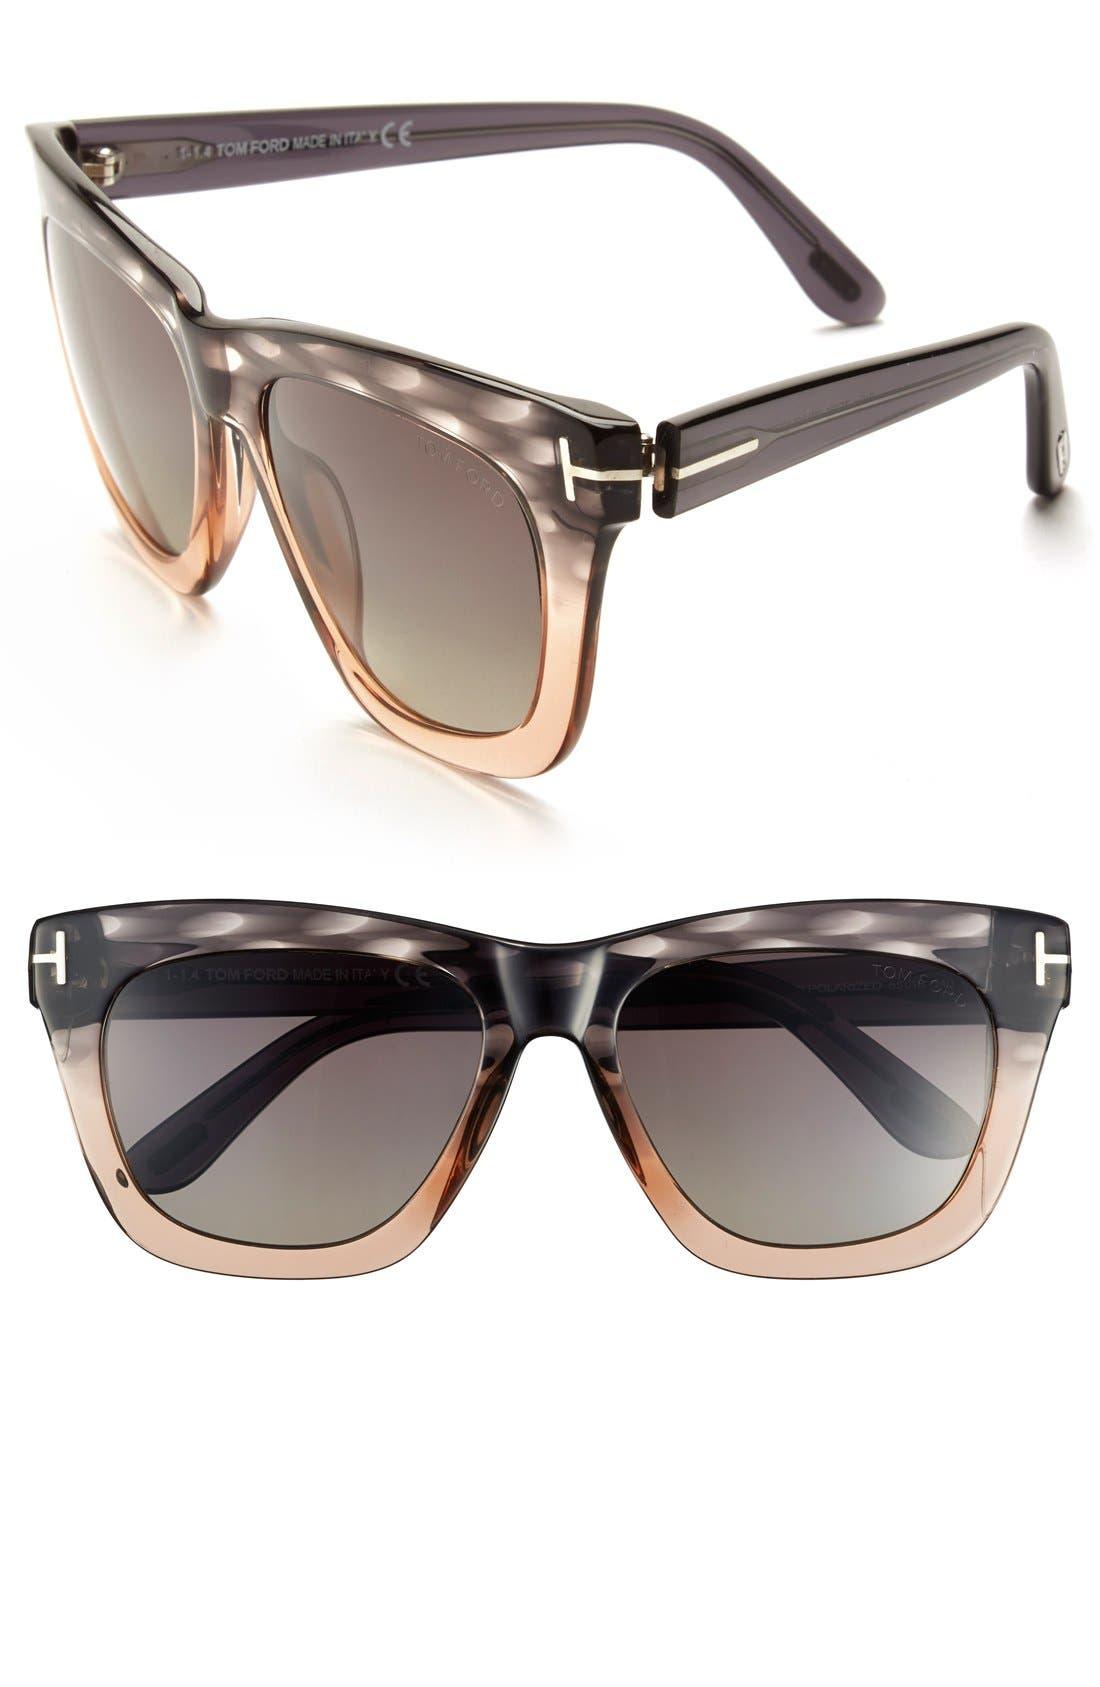 Main Image - Tom Ford 'Celina' 55mm Polarized Sunglasses